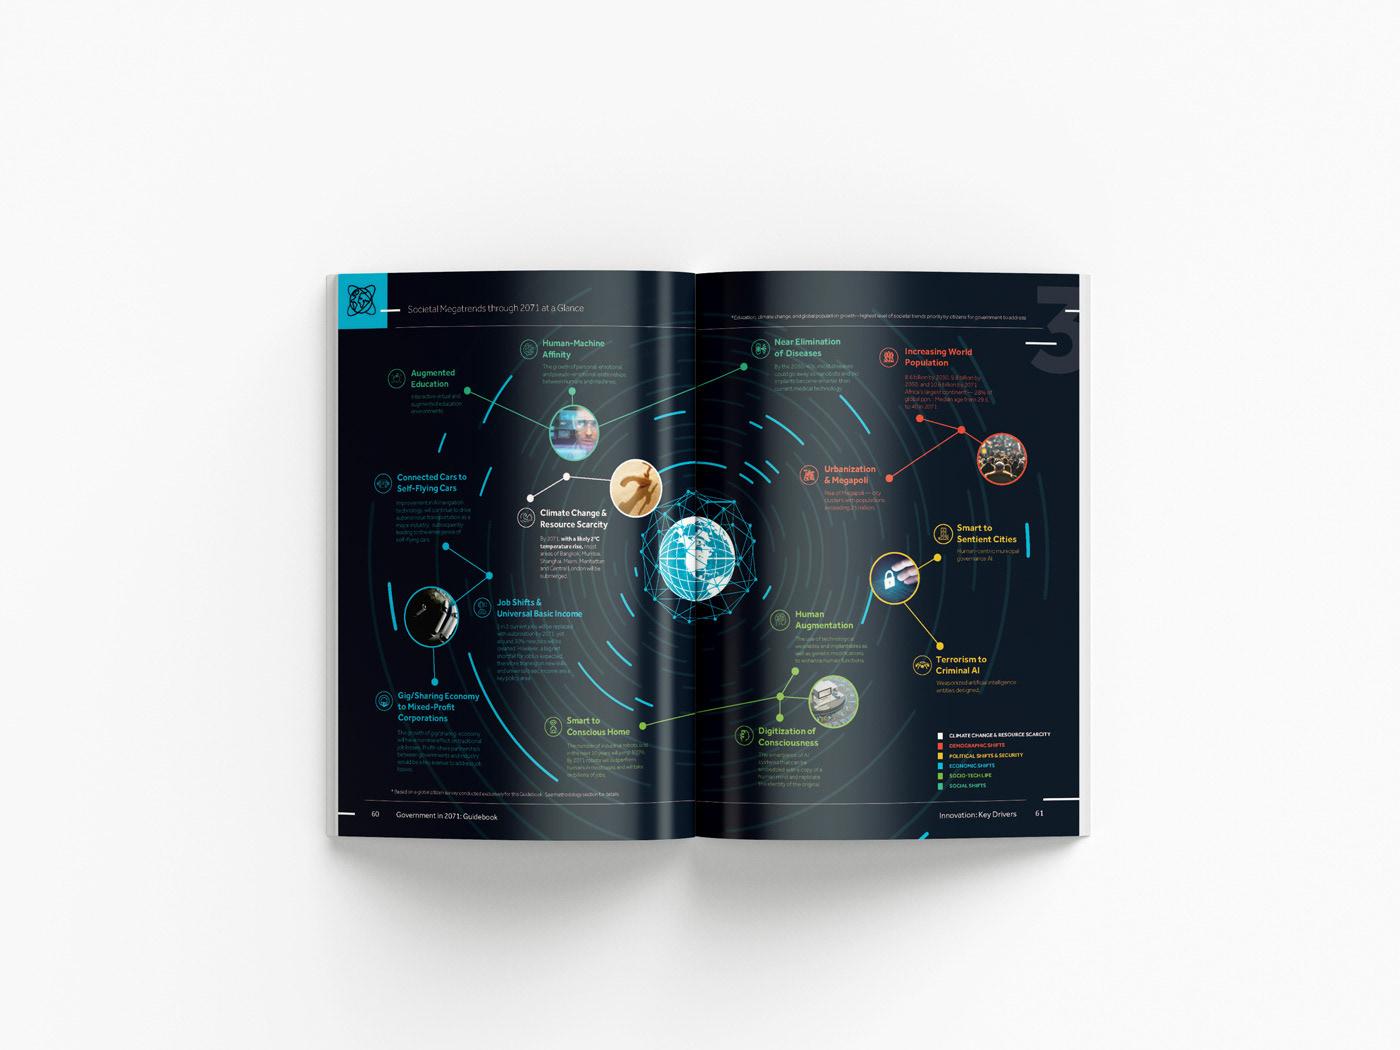 InDesign future book Guide illustrations